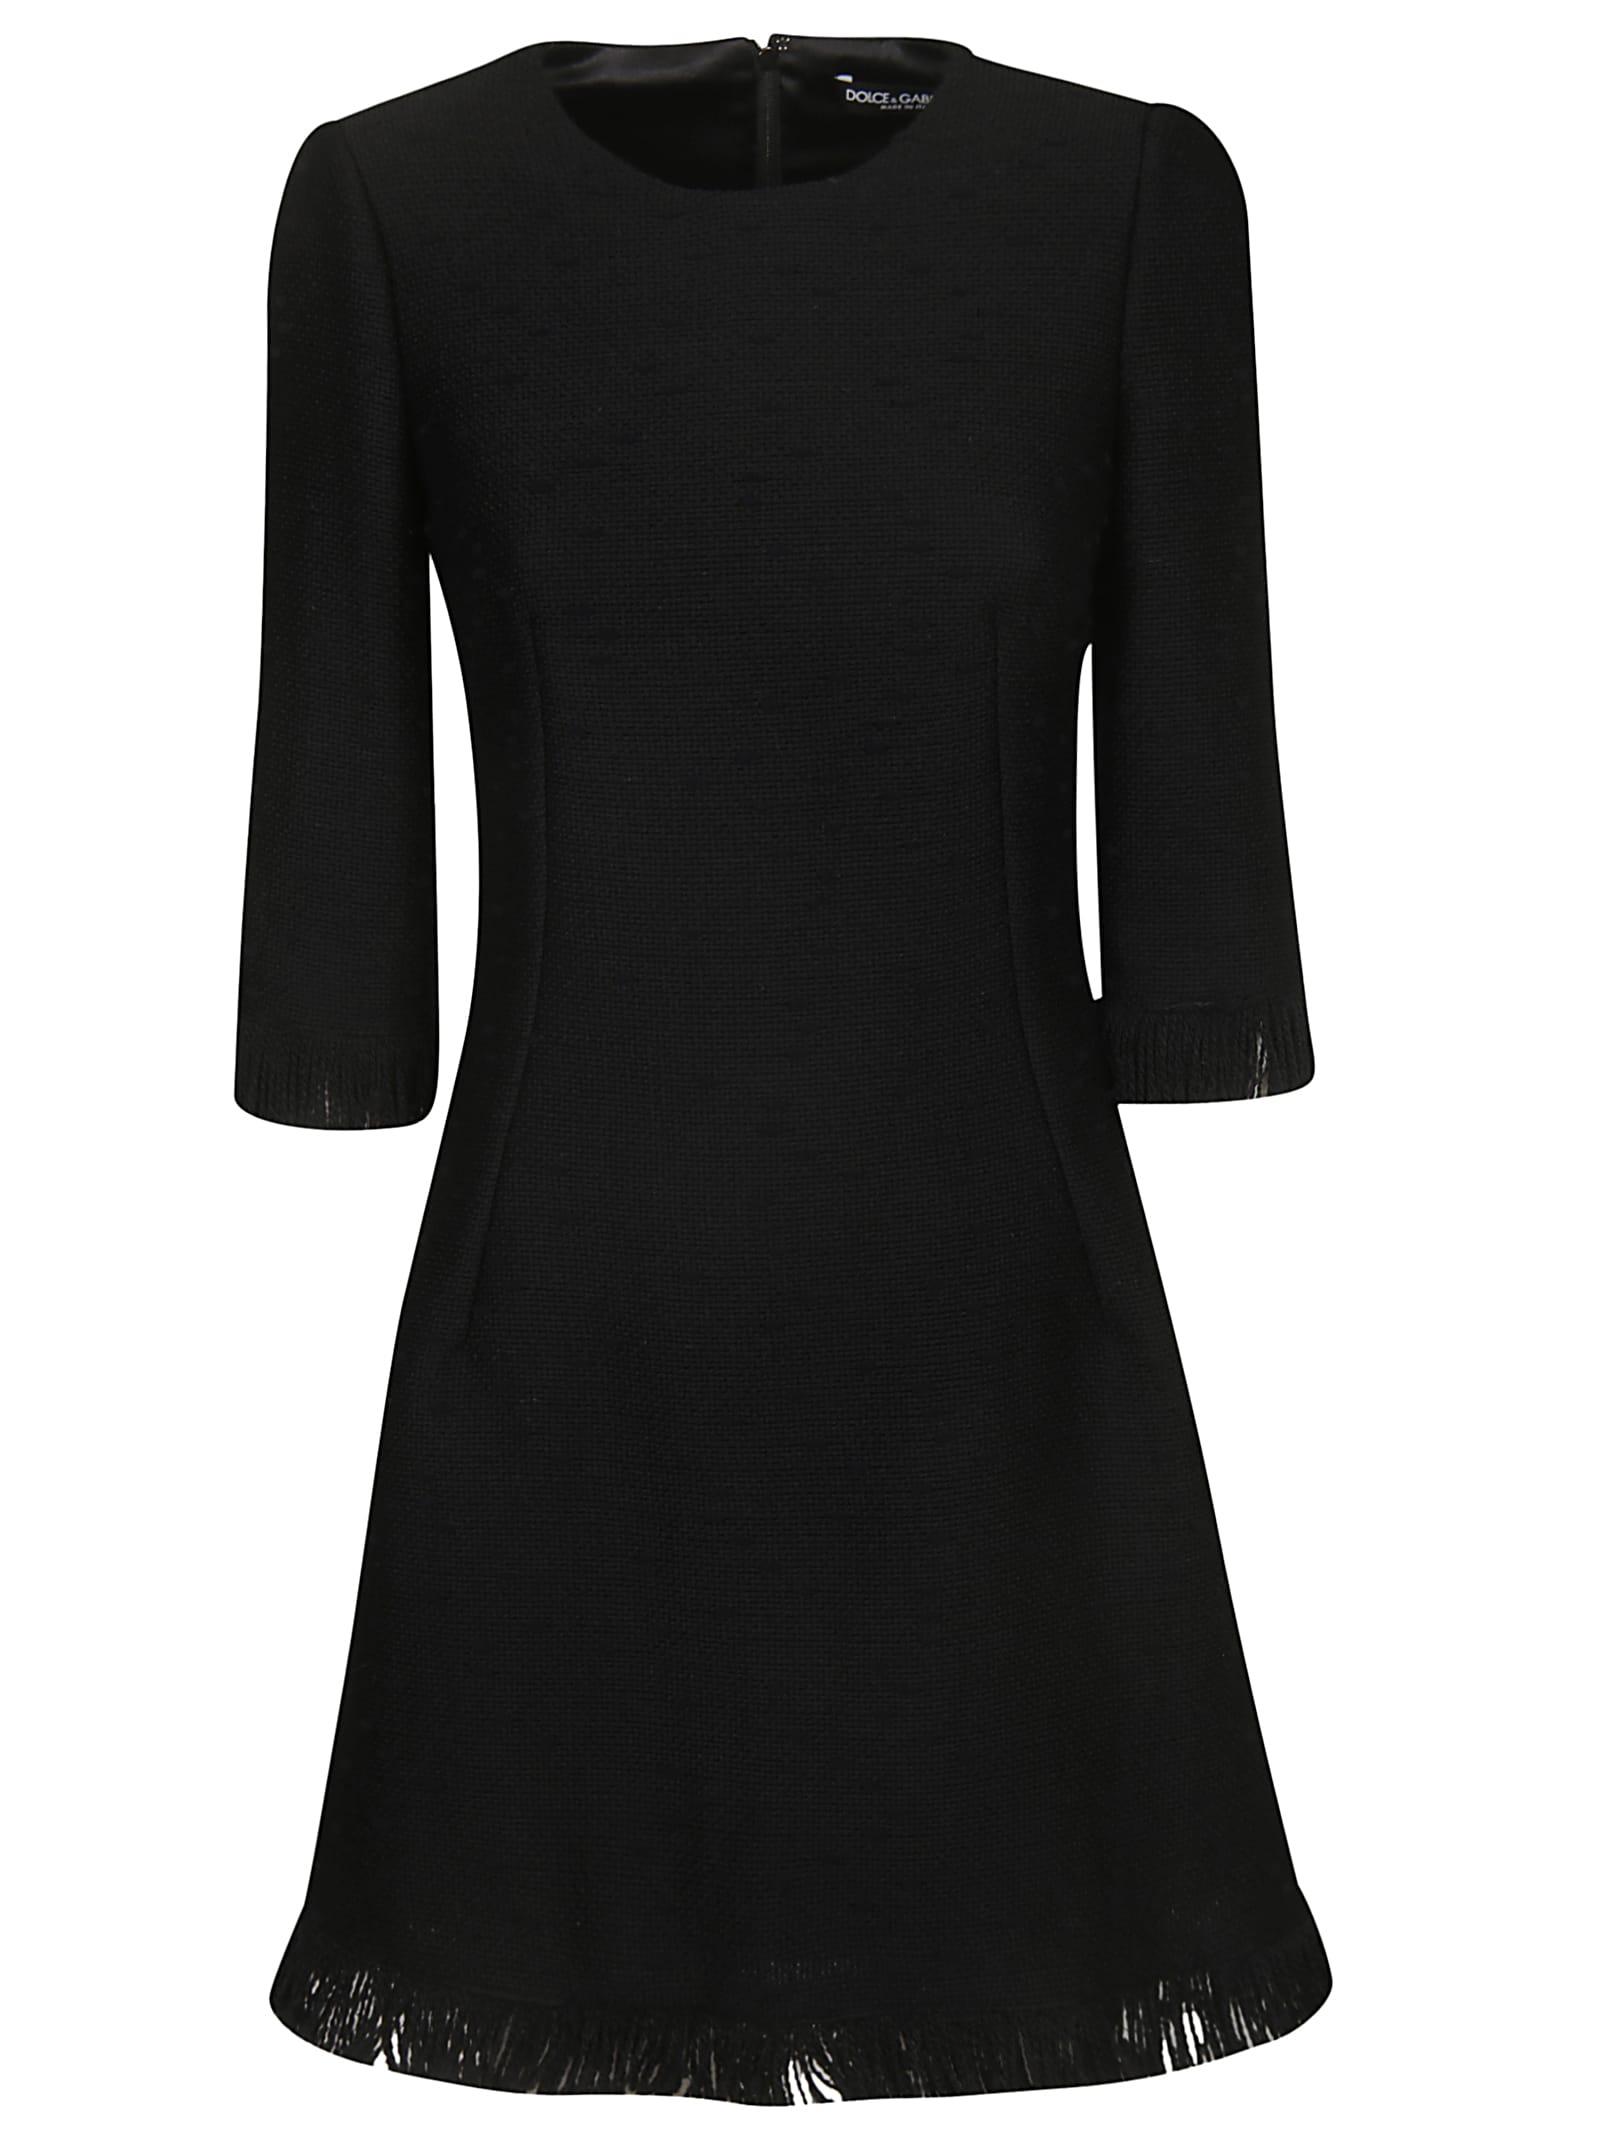 Dolce & Gabbana Fringe Detail Dress